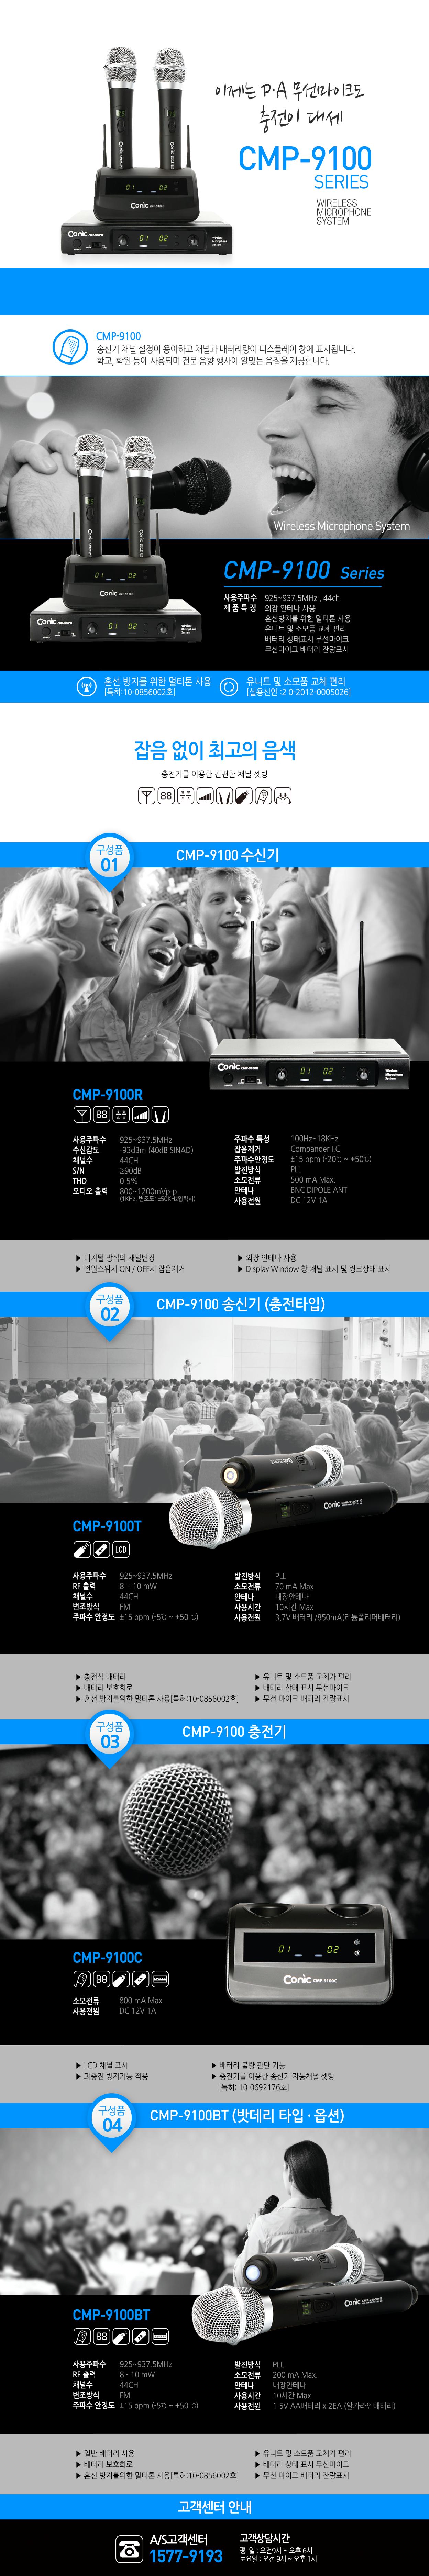 CMP-9100.png